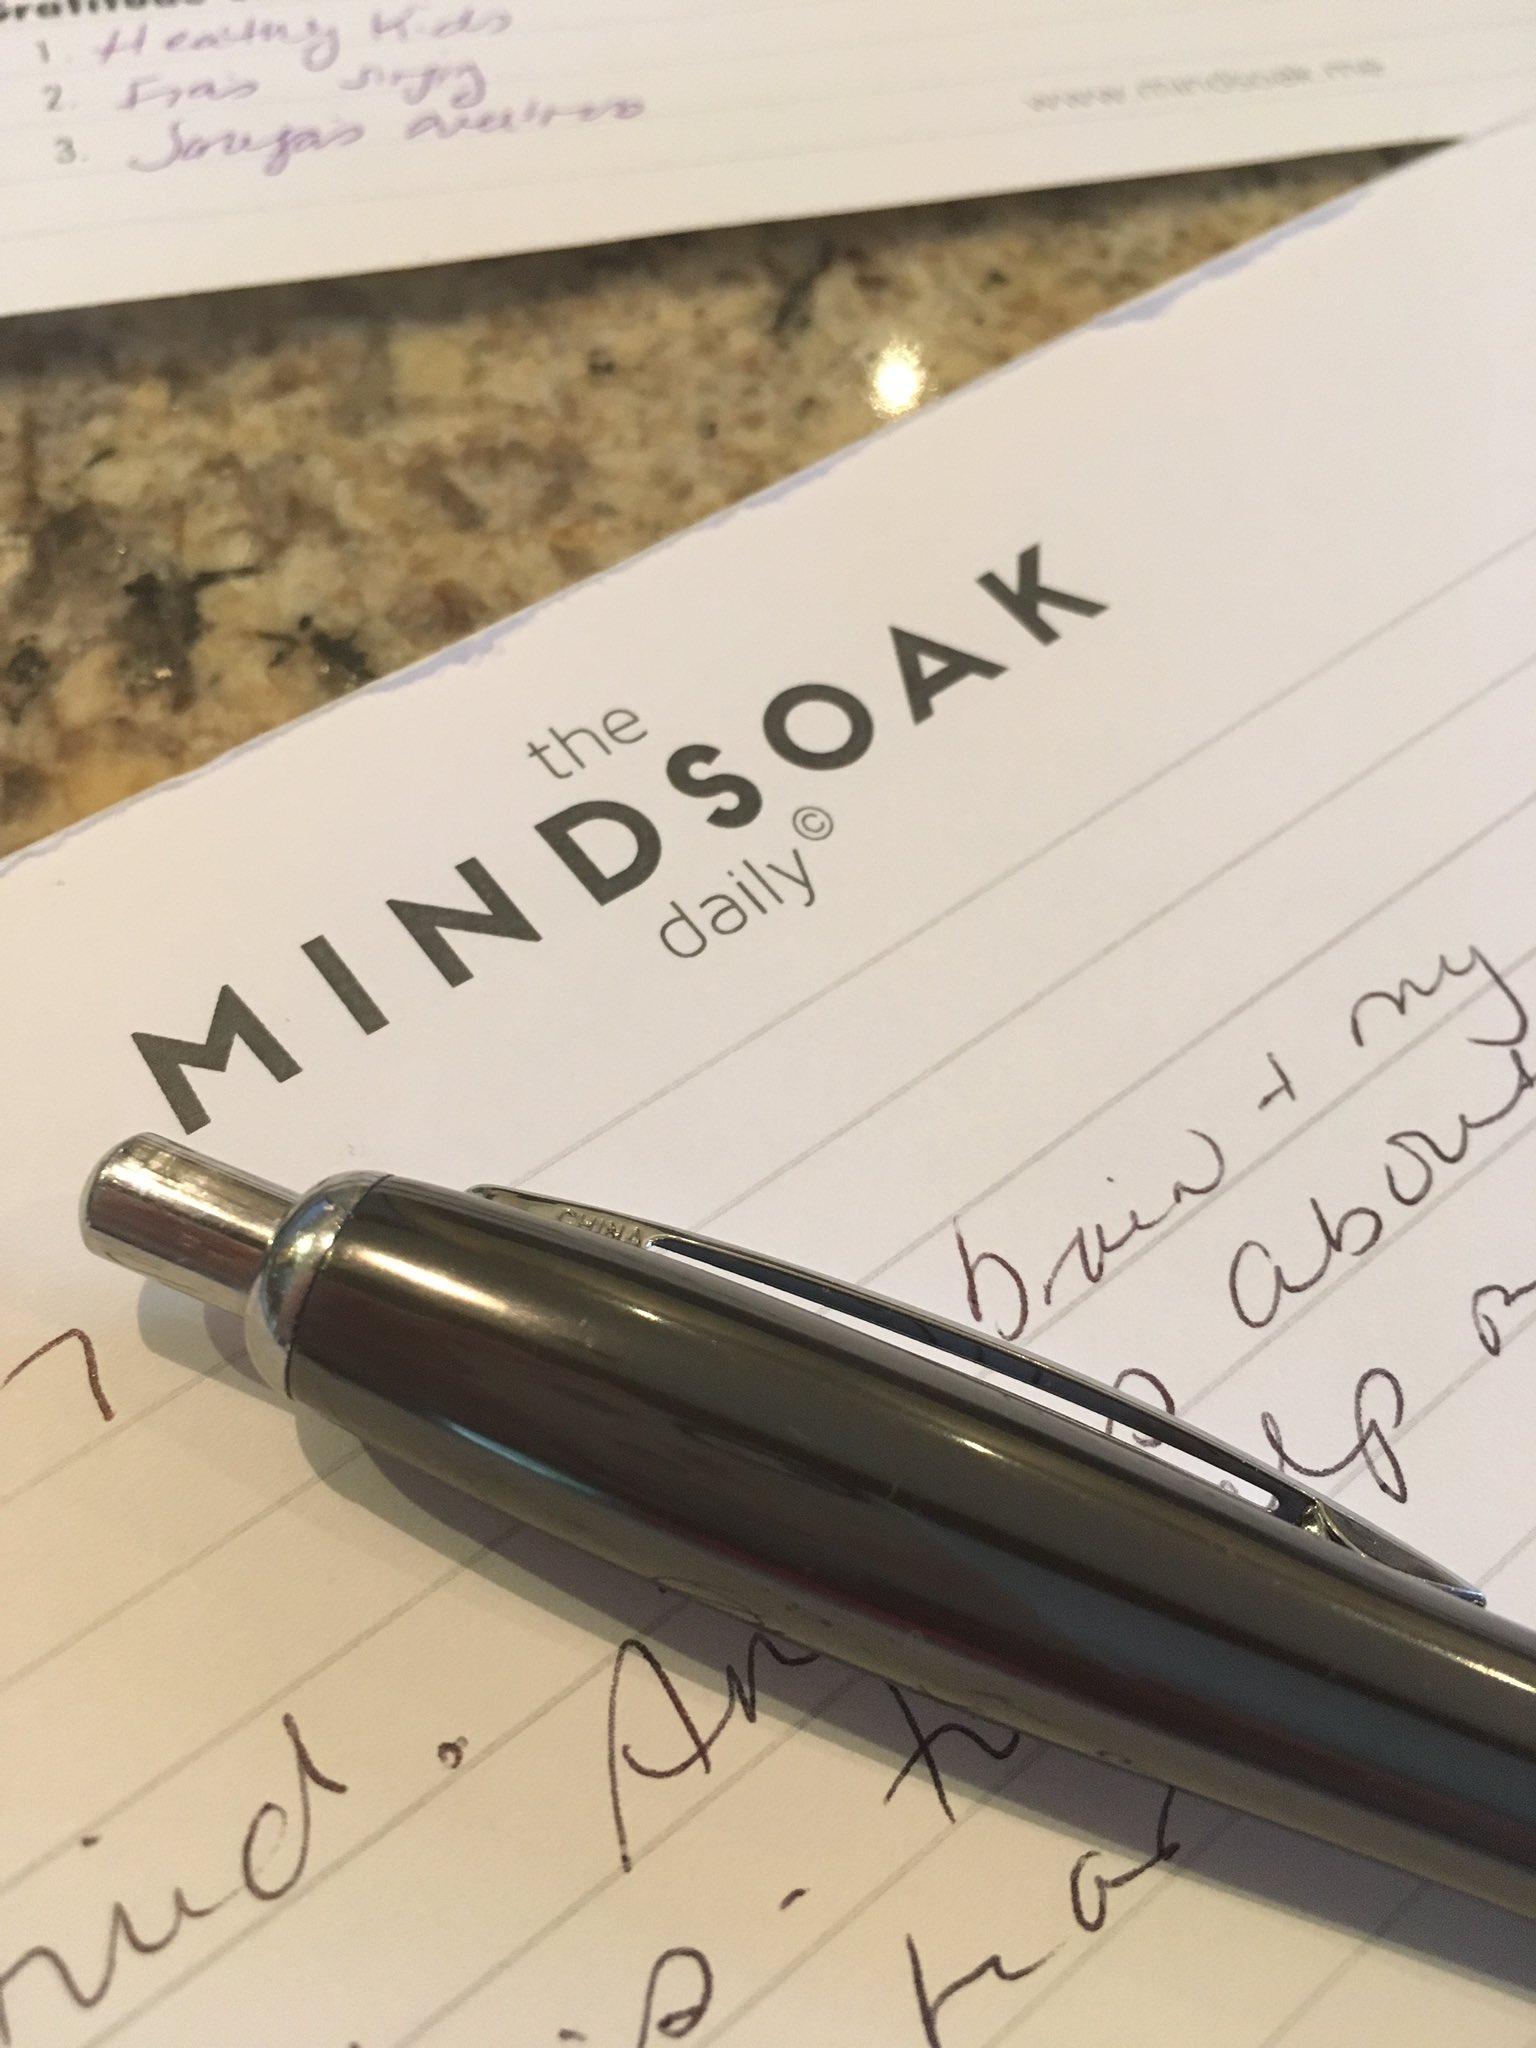 #journaling for a healthier mind and spirit. #wednesdaywisdom https://t.co/GPhjPxgIqr